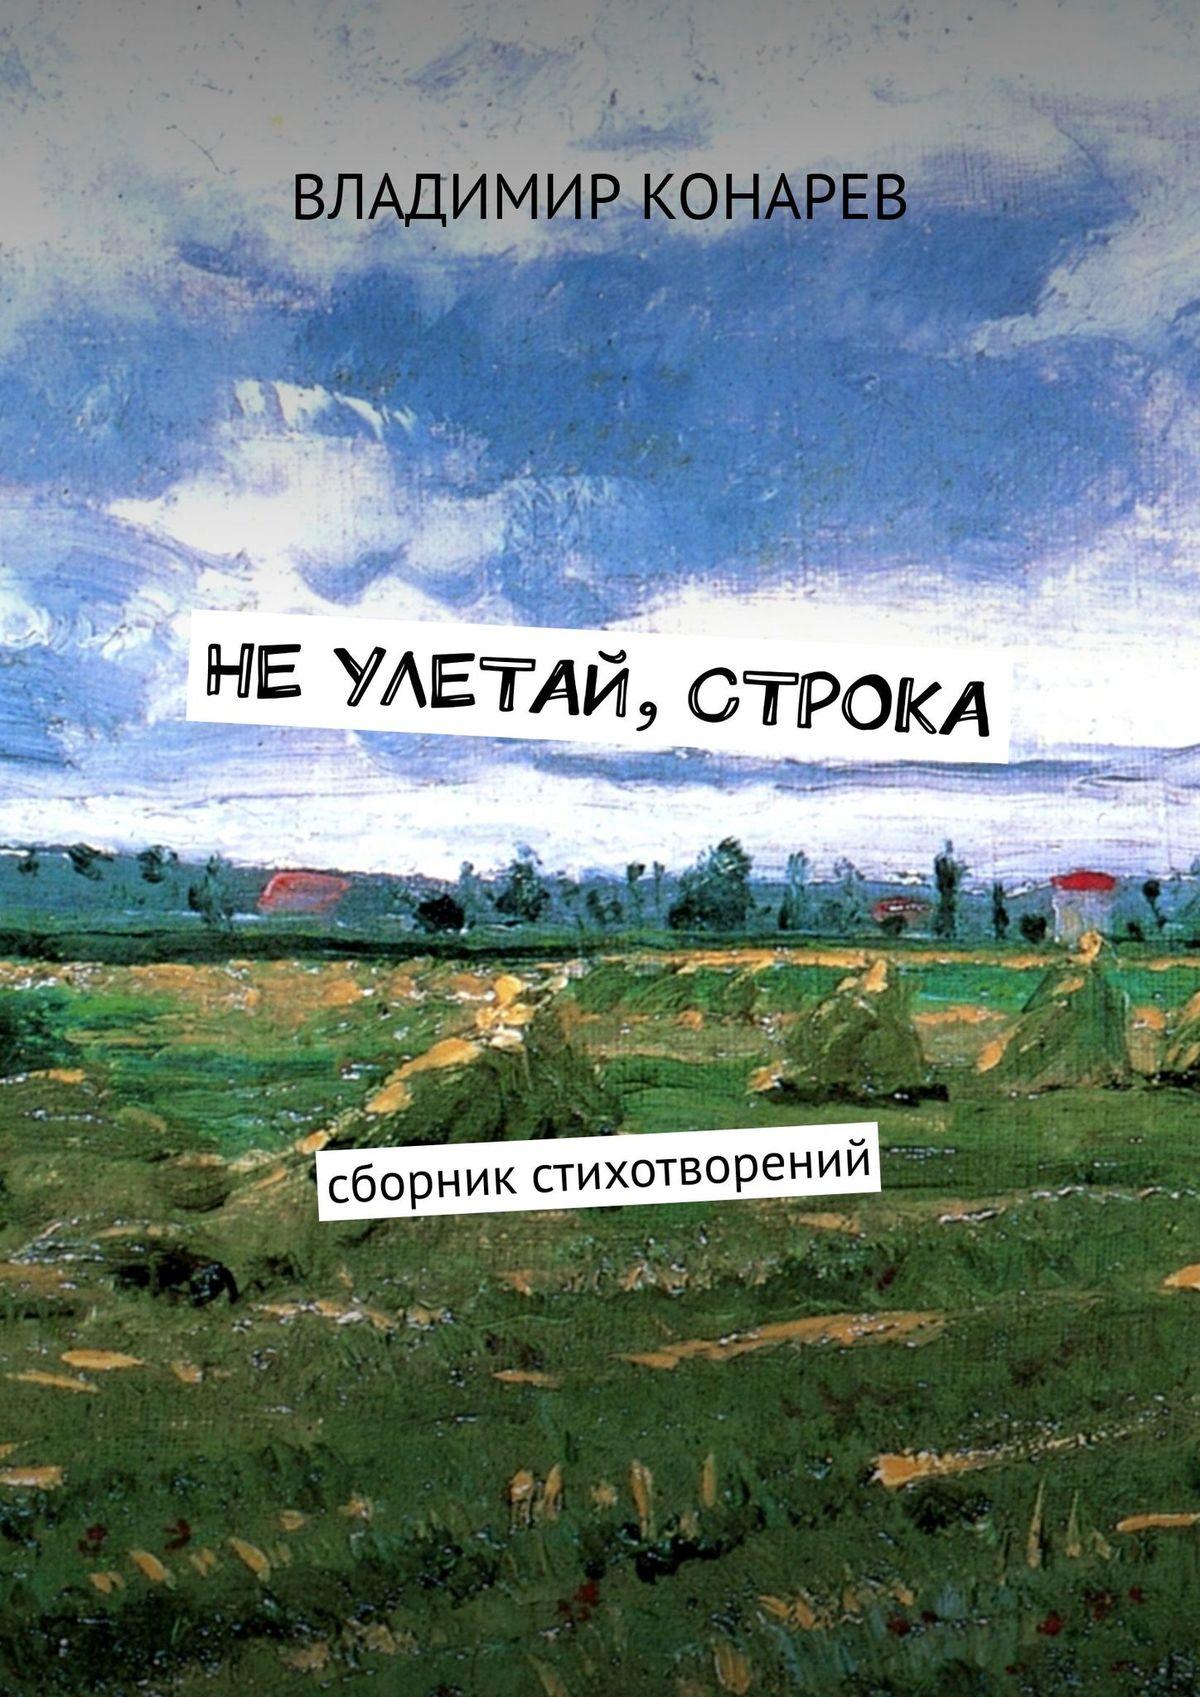 Владимир Конарев Не улетай, строка. Сборник стихотворений lowell настенные часы lowell 21435 коллекция